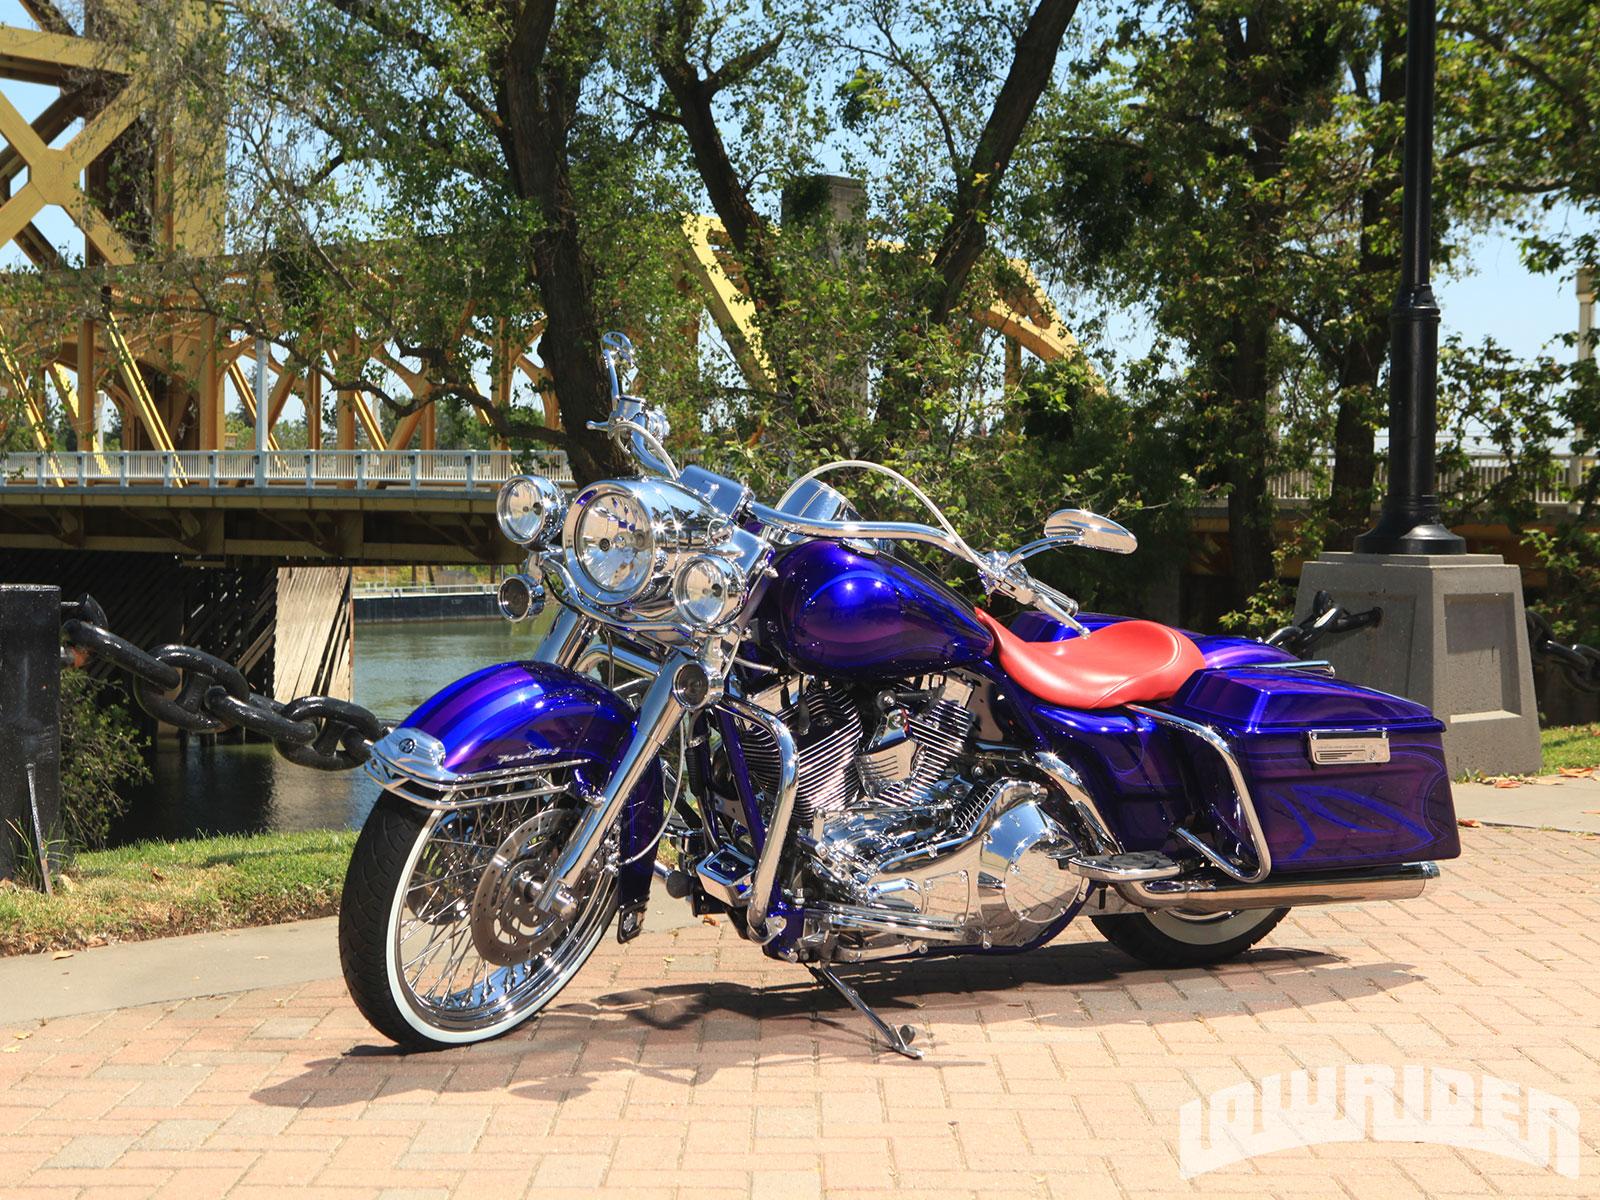 2006 Harley Davidson Road King Lowrider Magazine